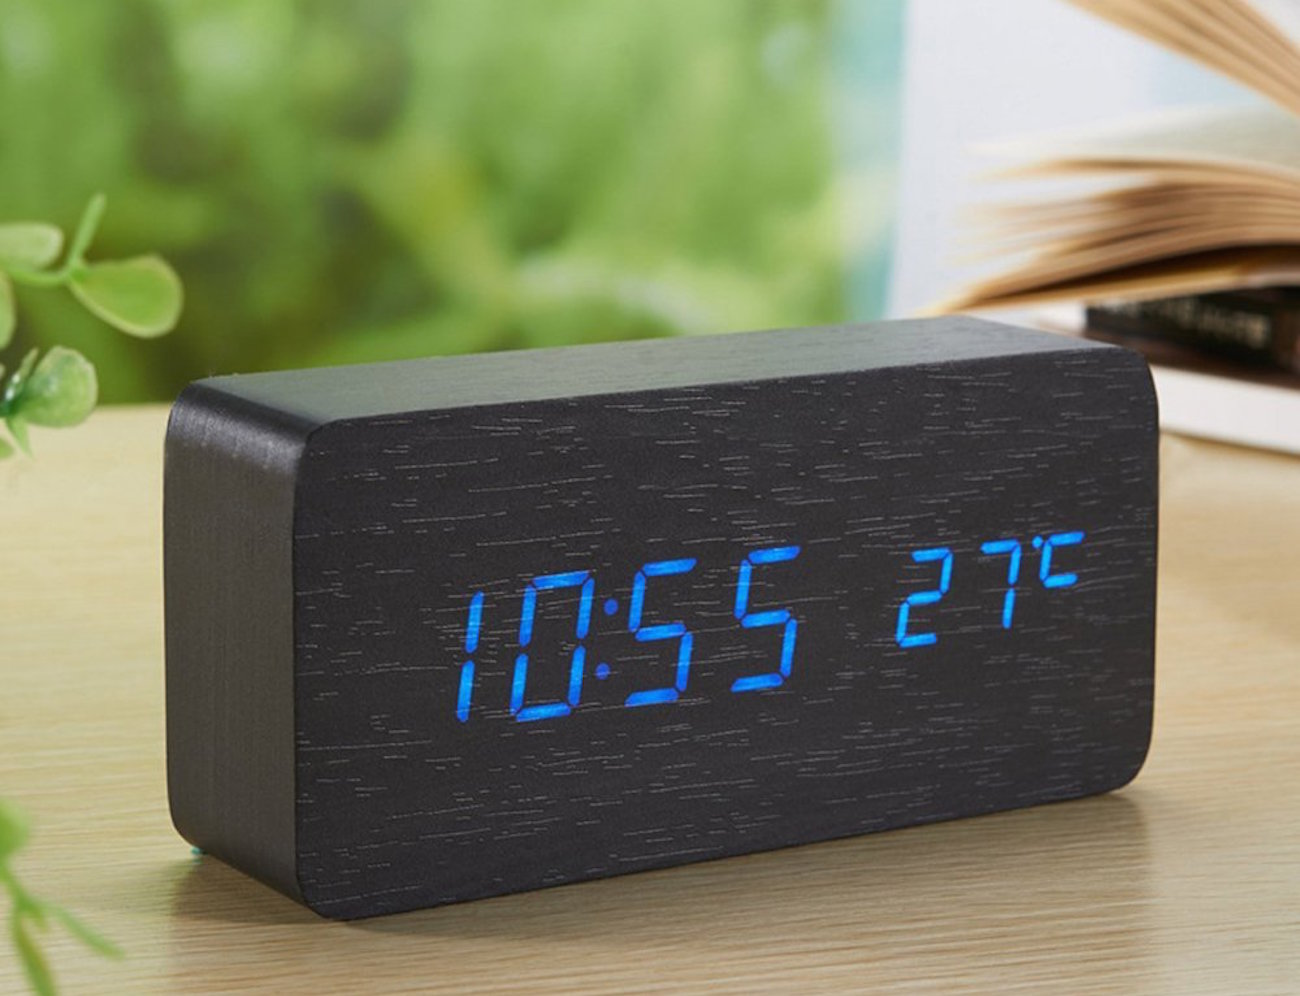 sea-team-wood-imitation-electronic-desk-clock-02